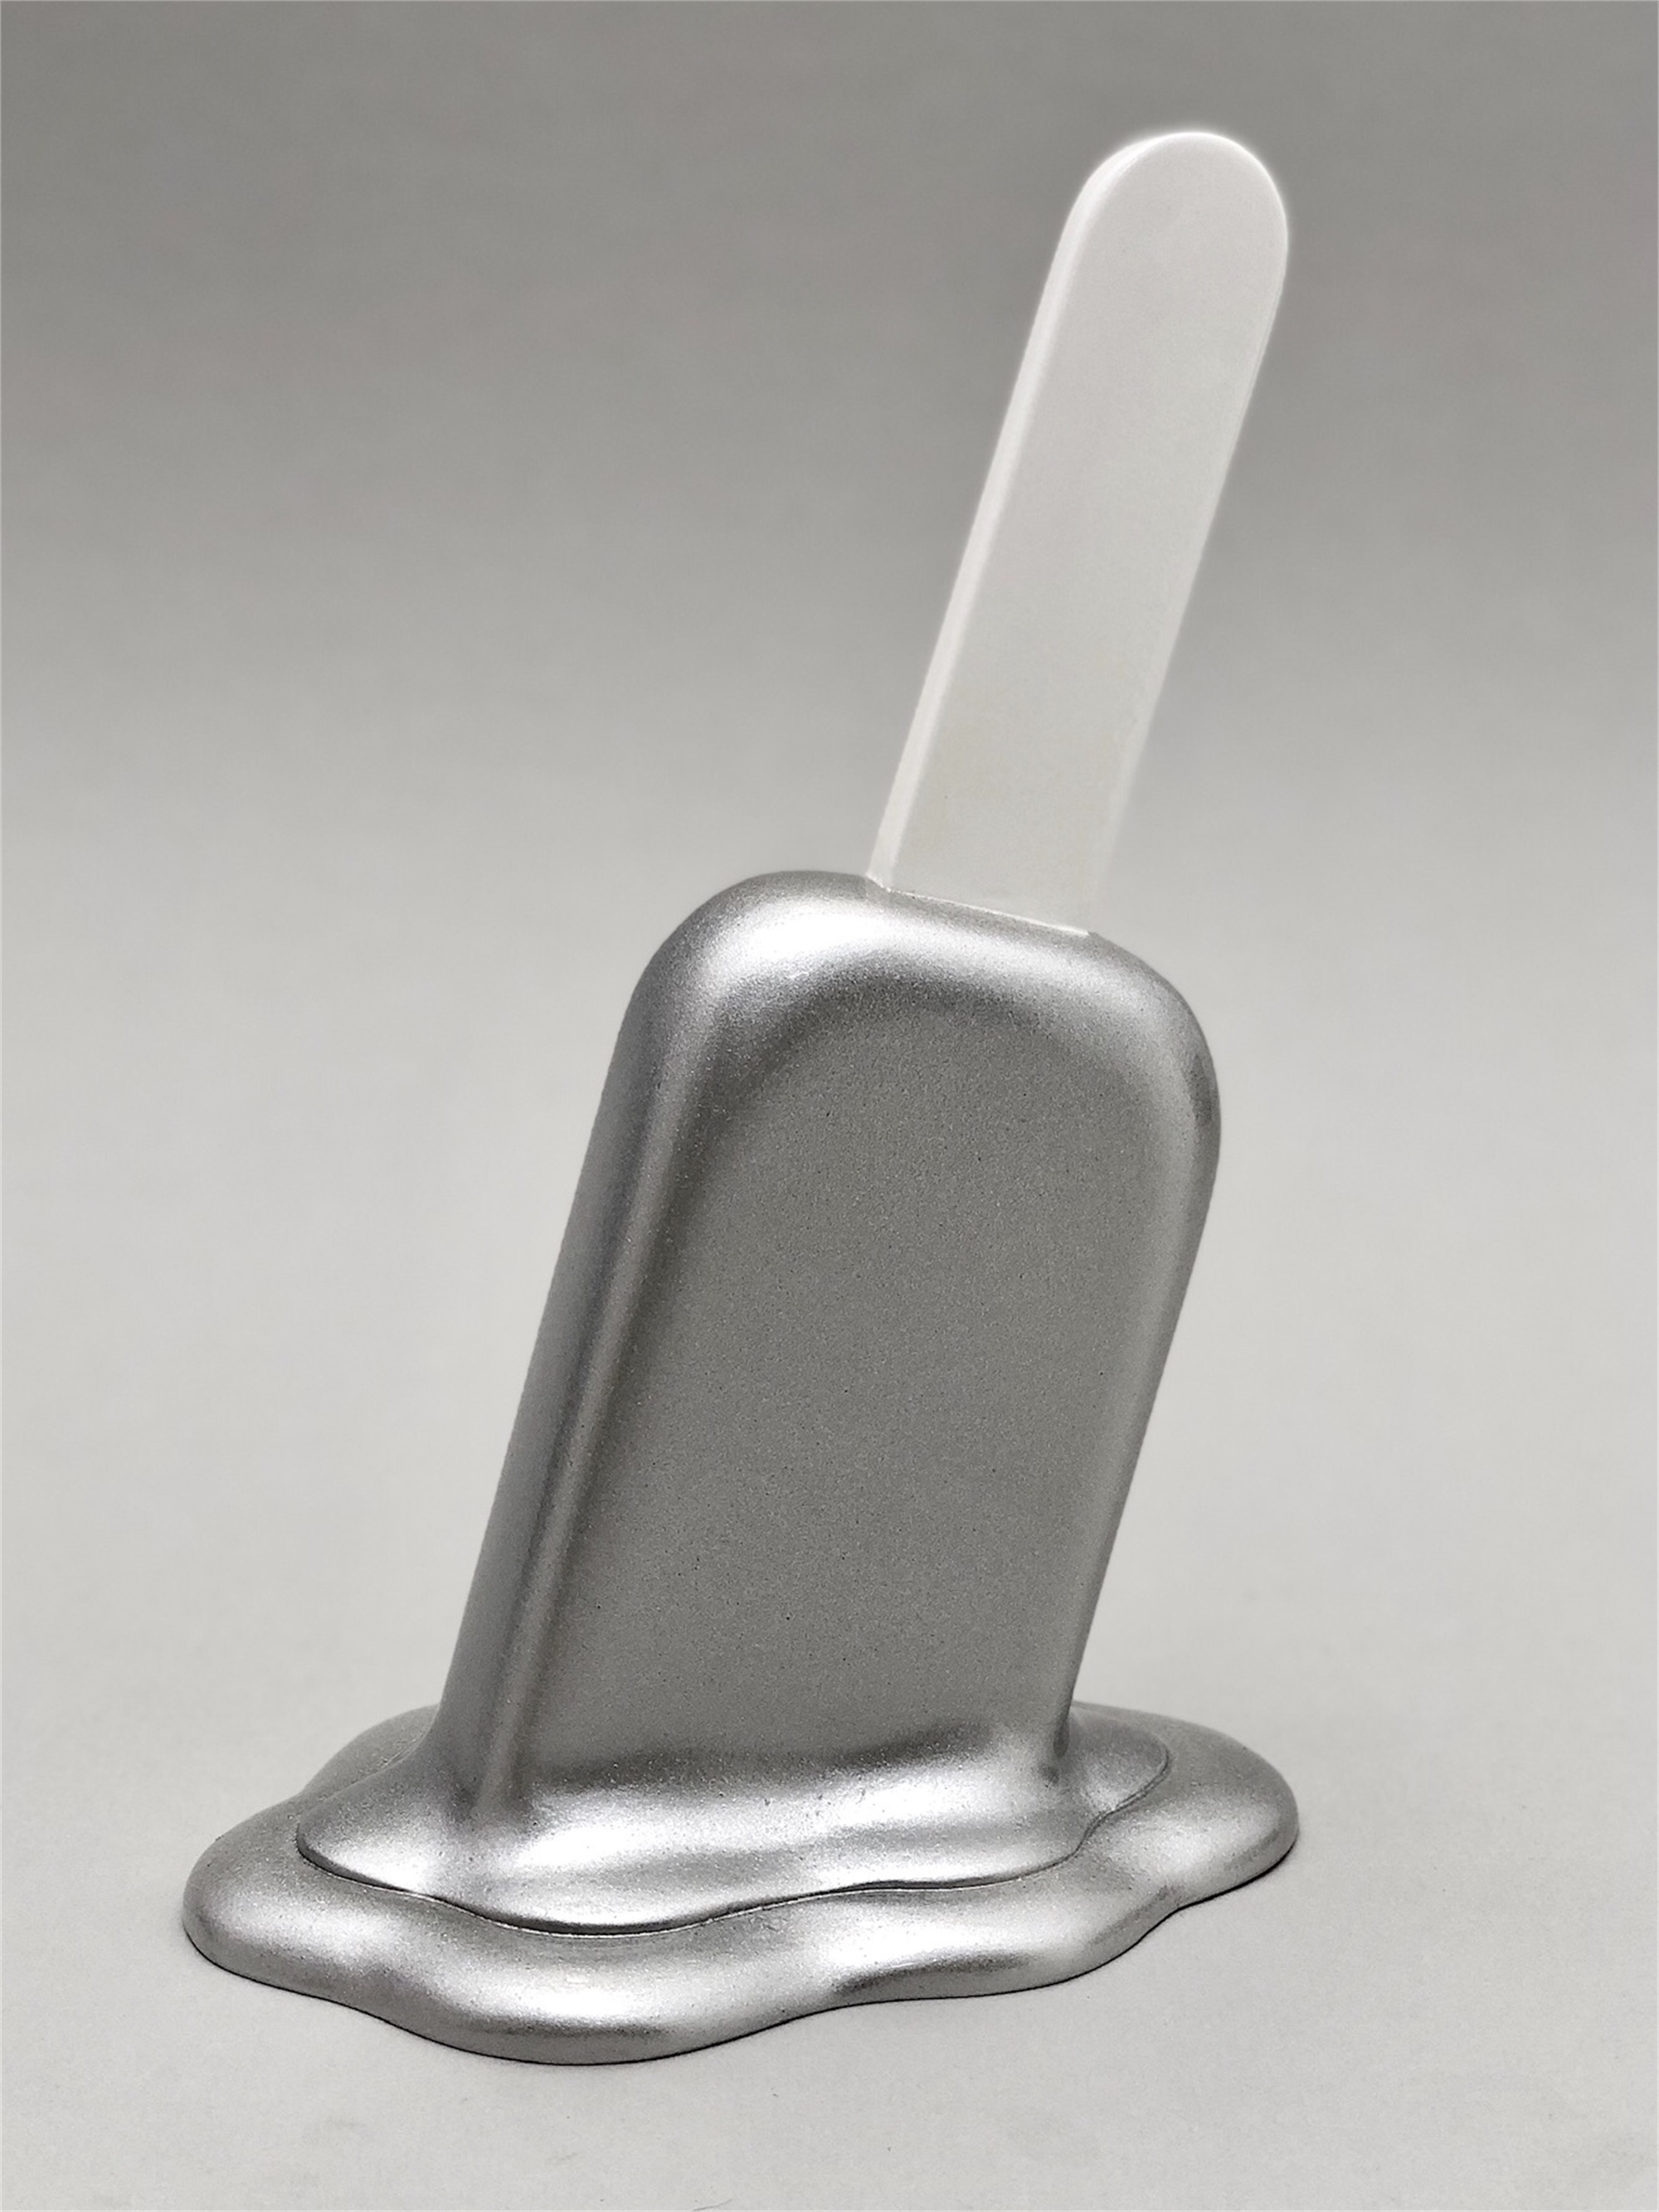 The Sweet Life, small, silver metallic Popsicle by Elena Bulatova